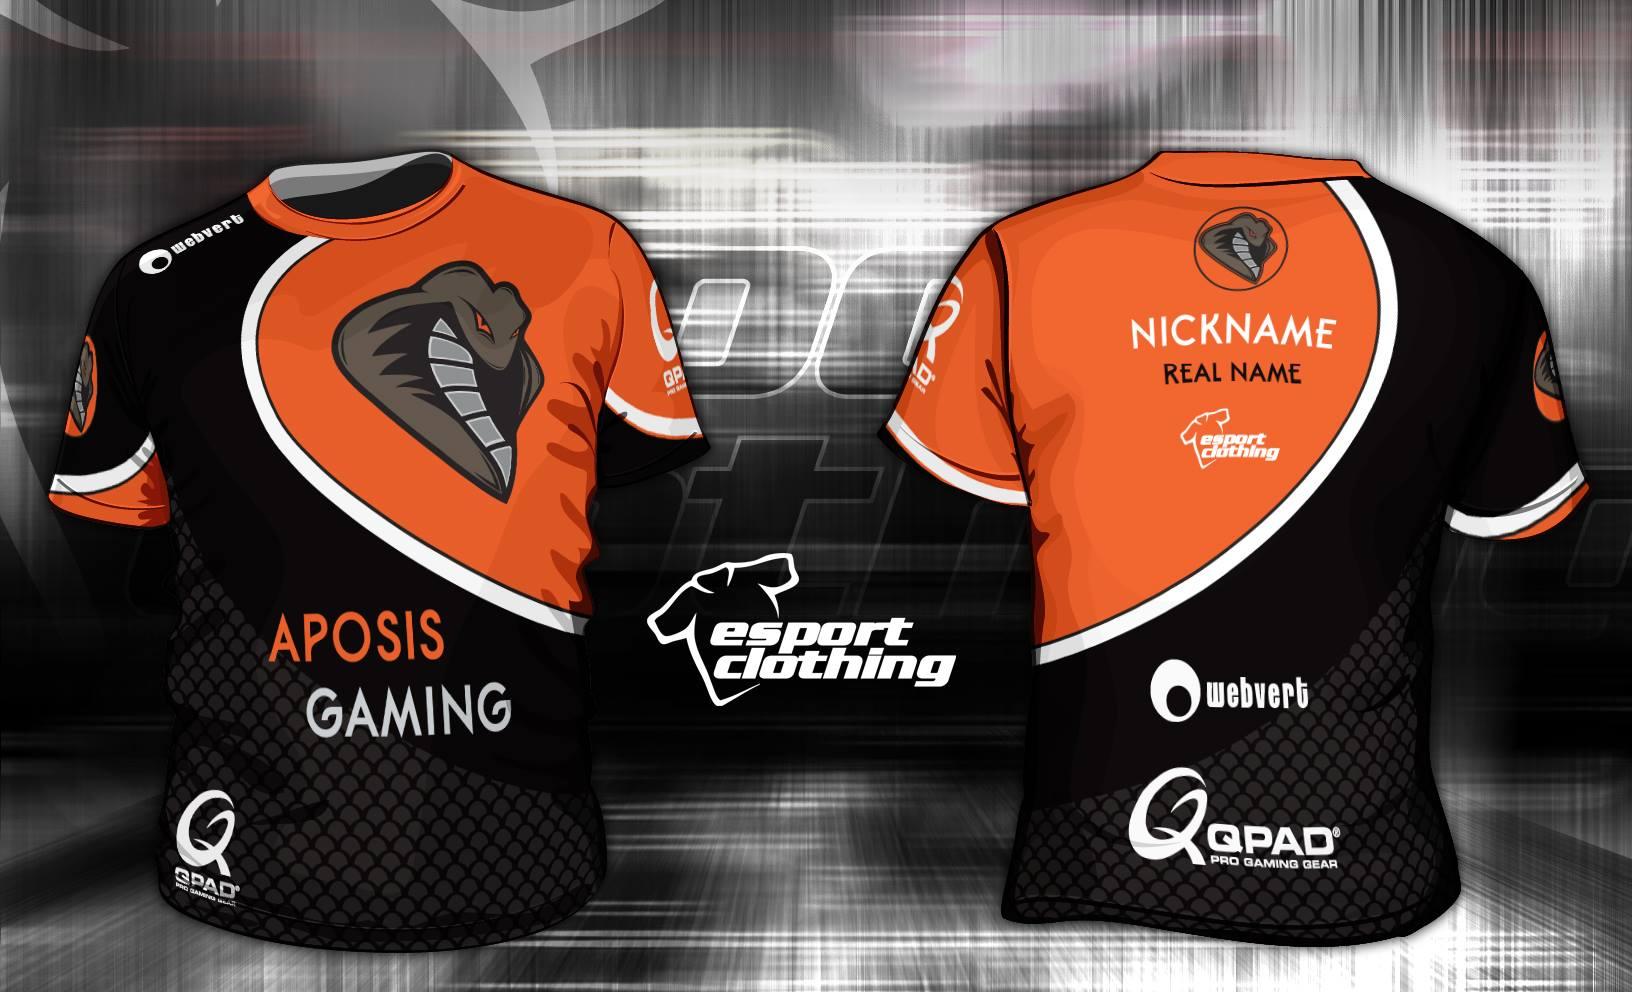 Aposis Gaming - Athlete Short Sleeve Jersey